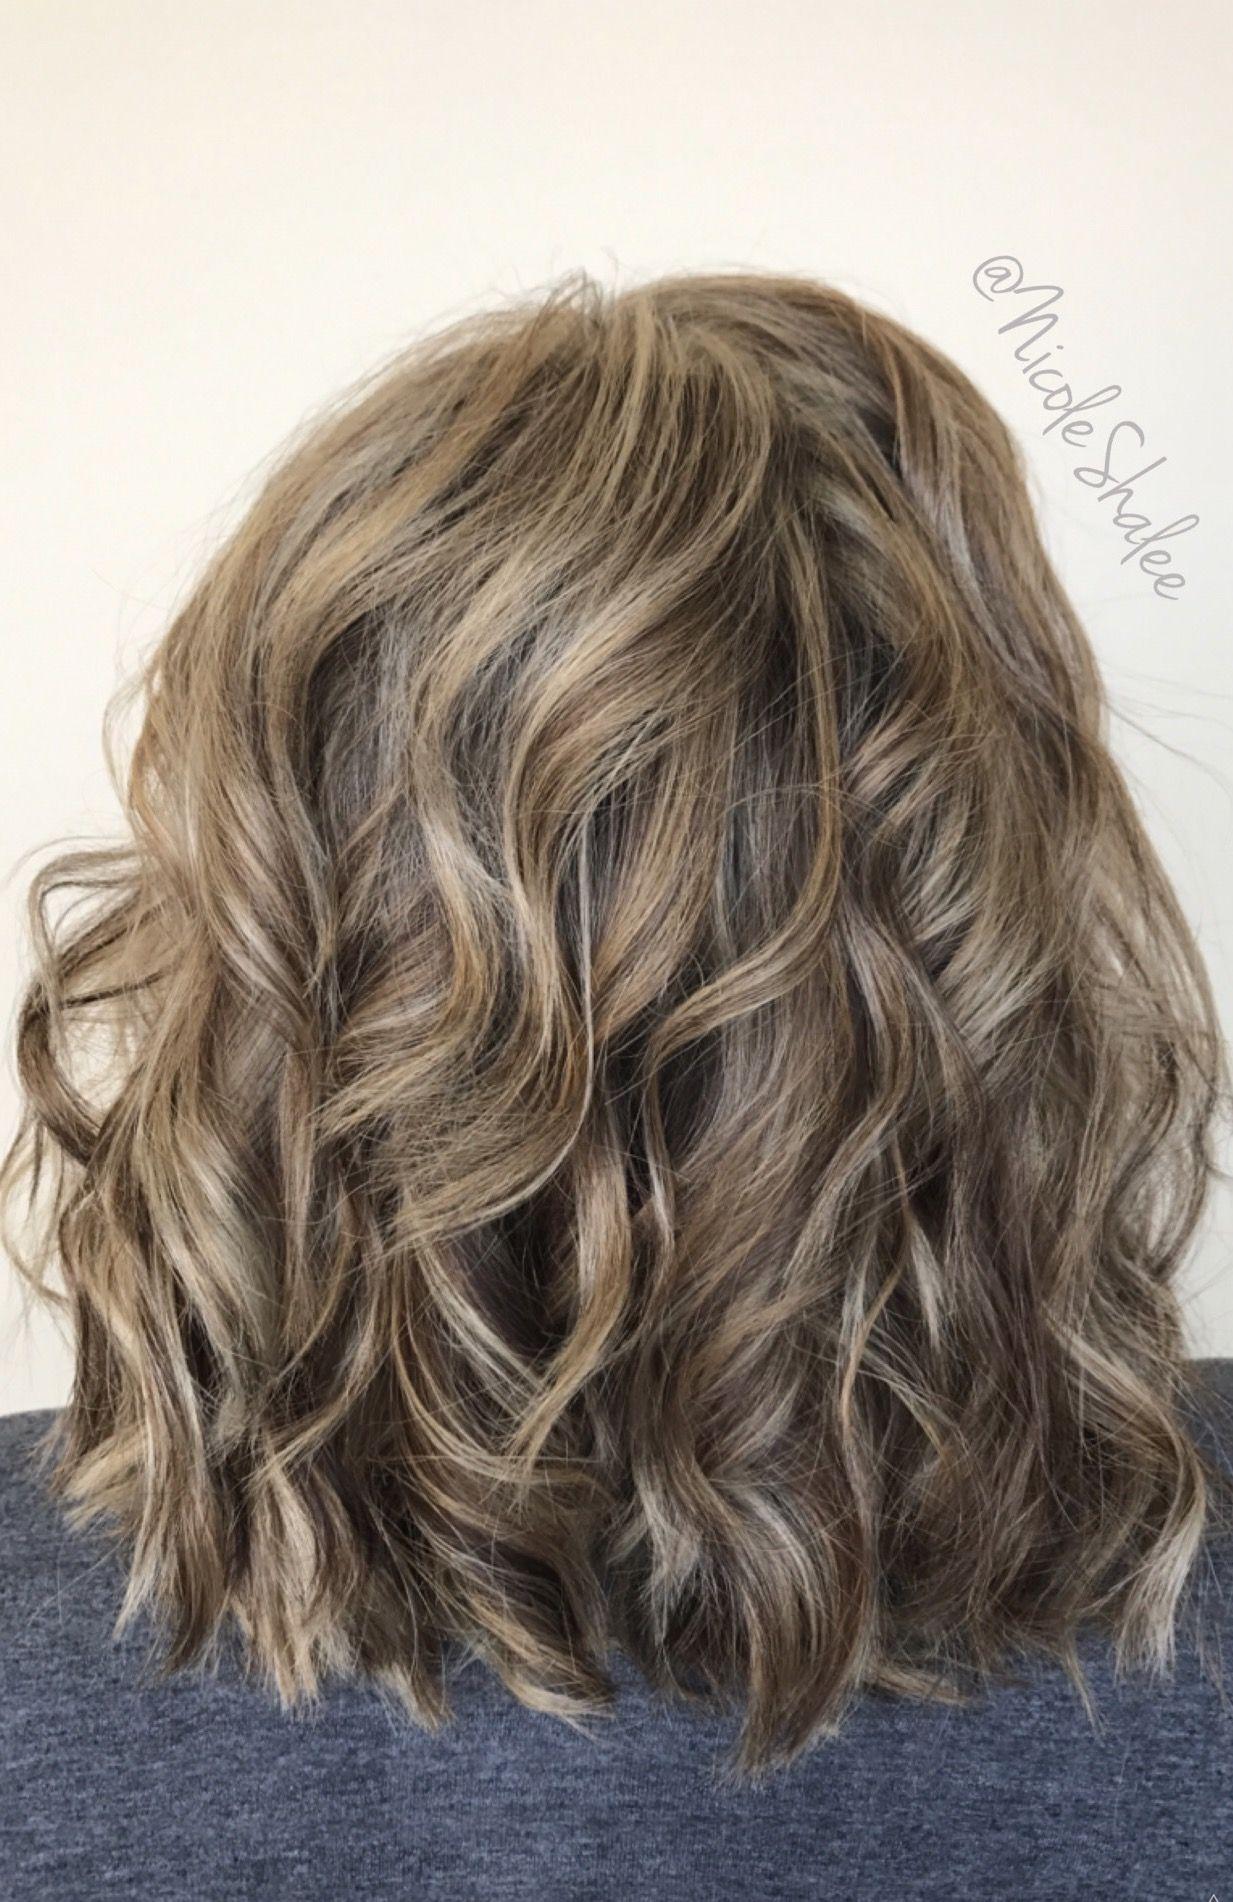 Lob Long Bob Beach Waves Bronde Hair Sandy Brown Hair Sandy Blonde Hair Curled Hair